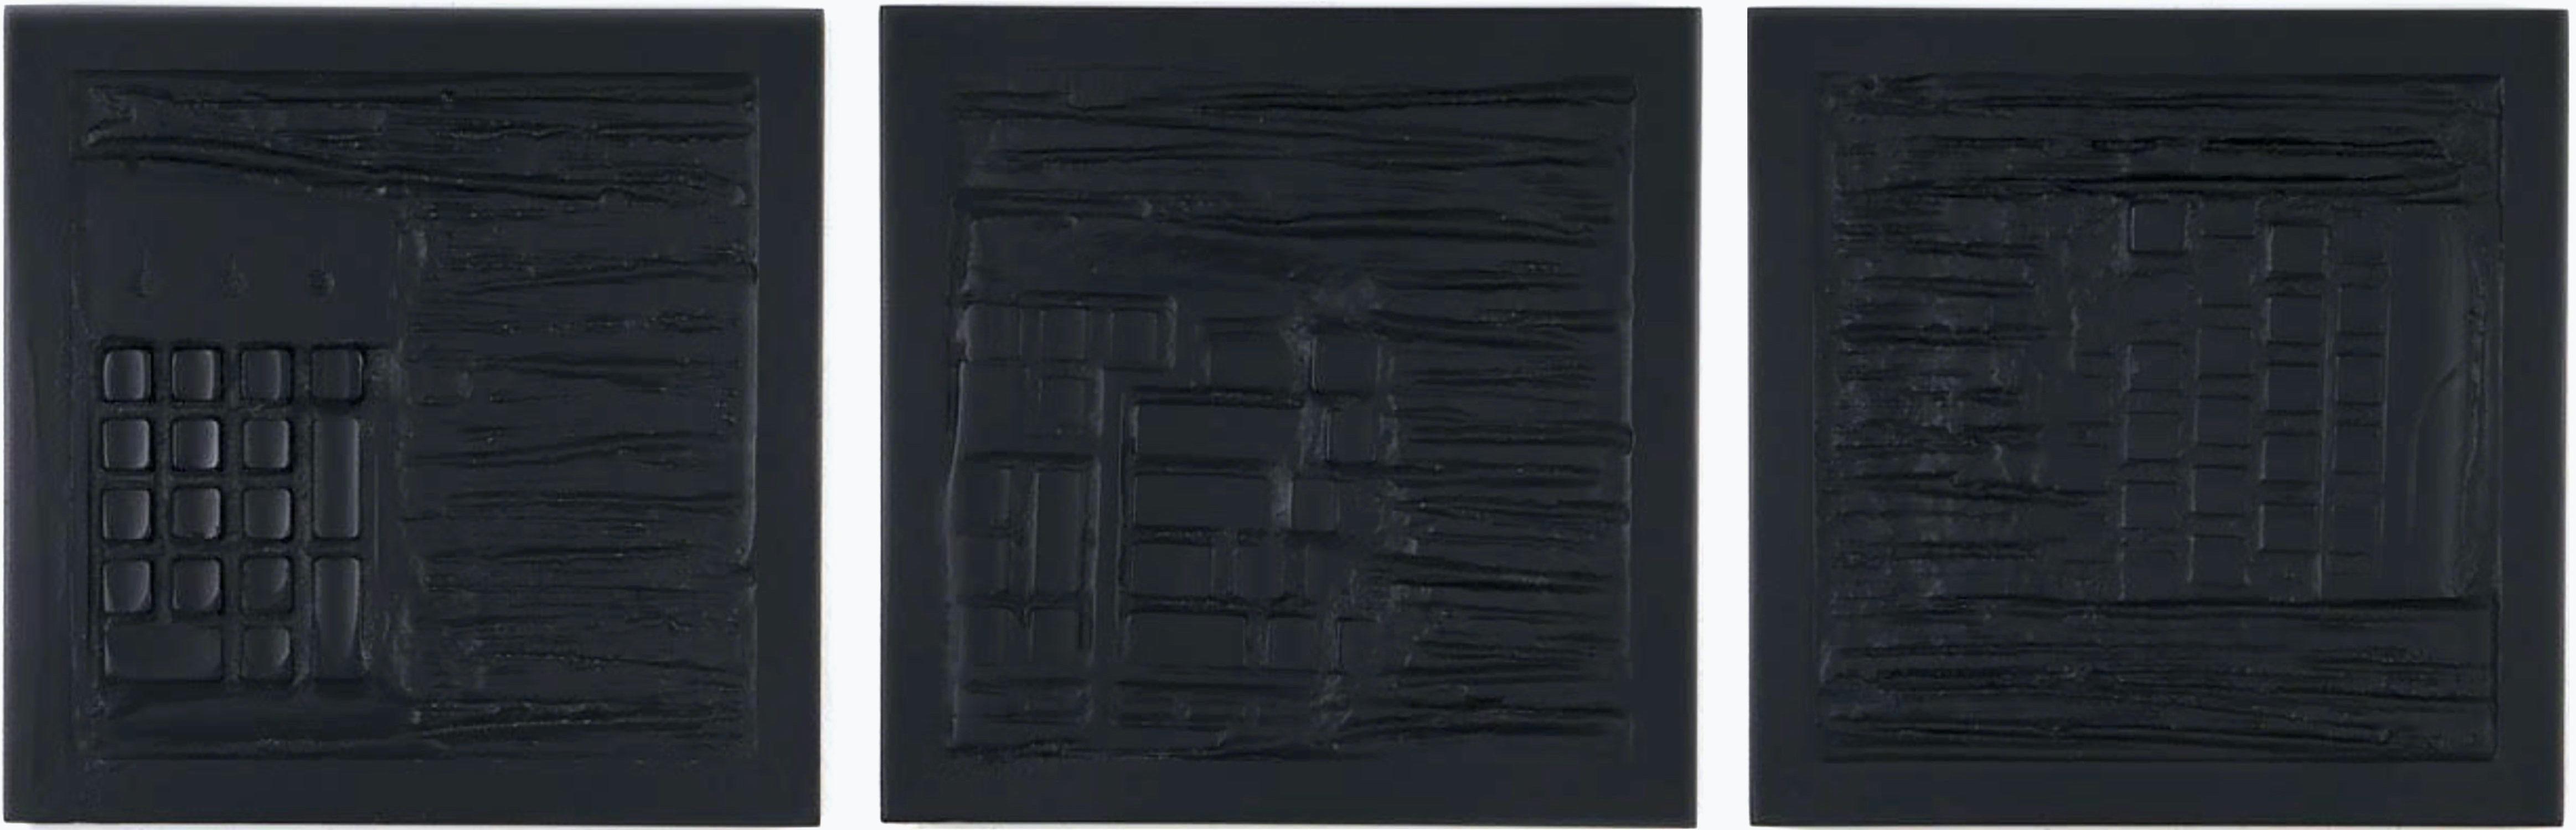 """Pen Decline 1 - 2 - 3 in Black"" (Archeology series) Computer Keyboard Sculpture"